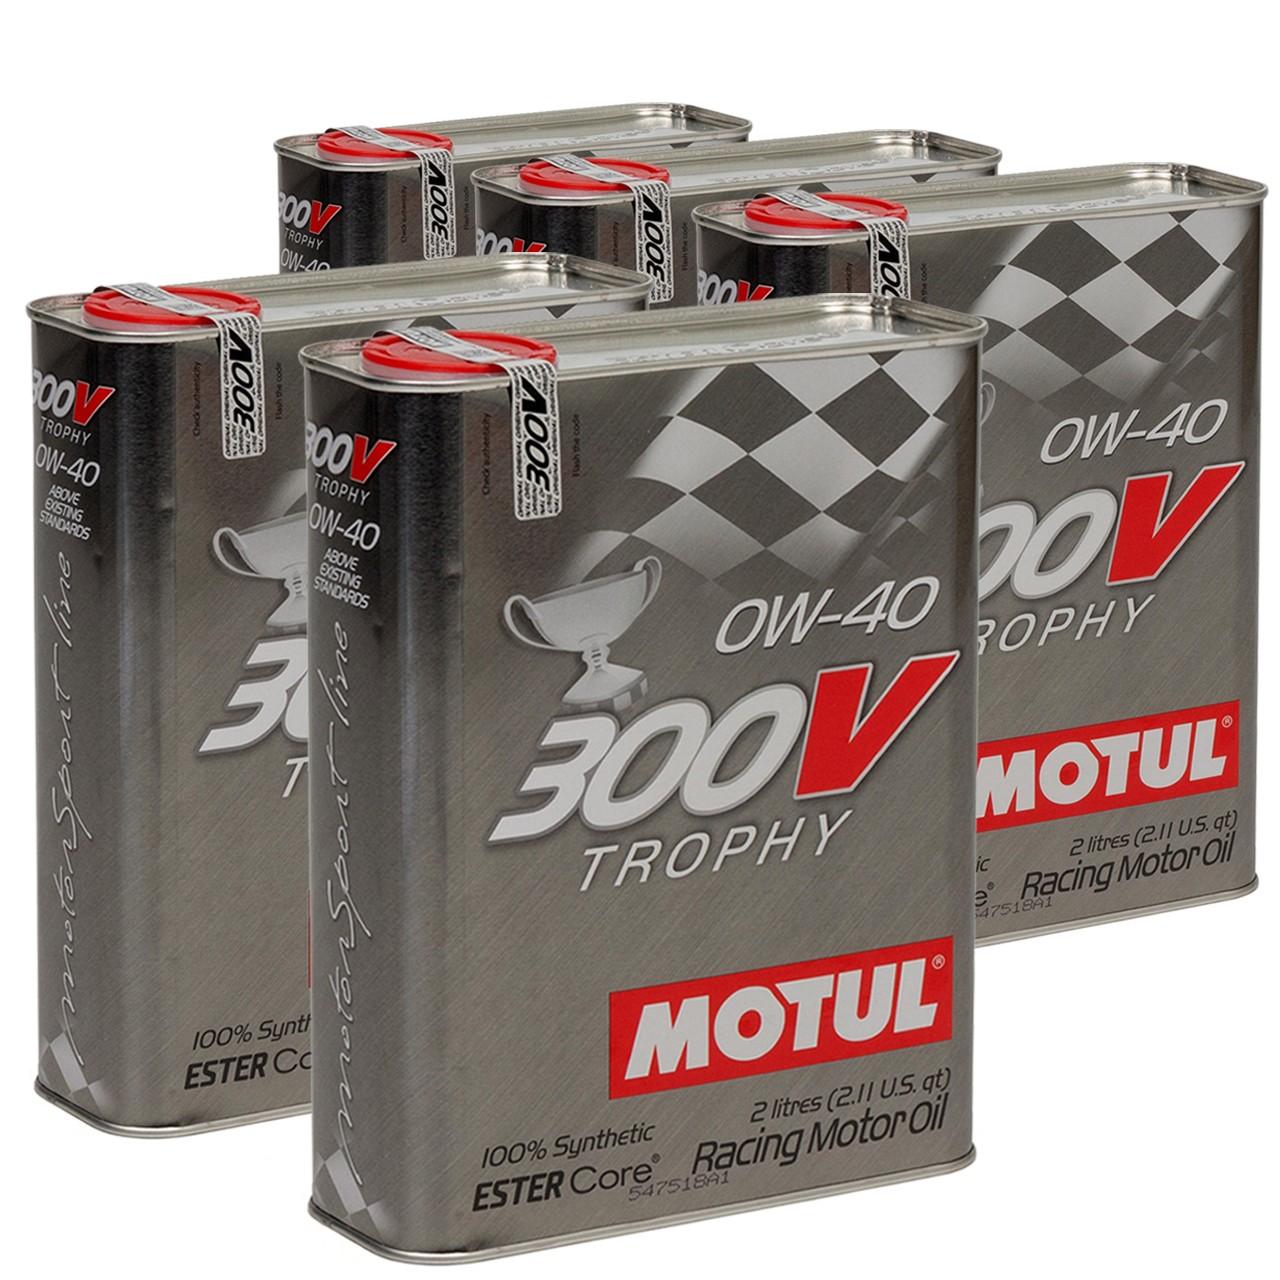 MOTUL 300V TROPHY RACING Motoröl Öl 0W40 100% Synthetic Ester Core 10L 10 Liter